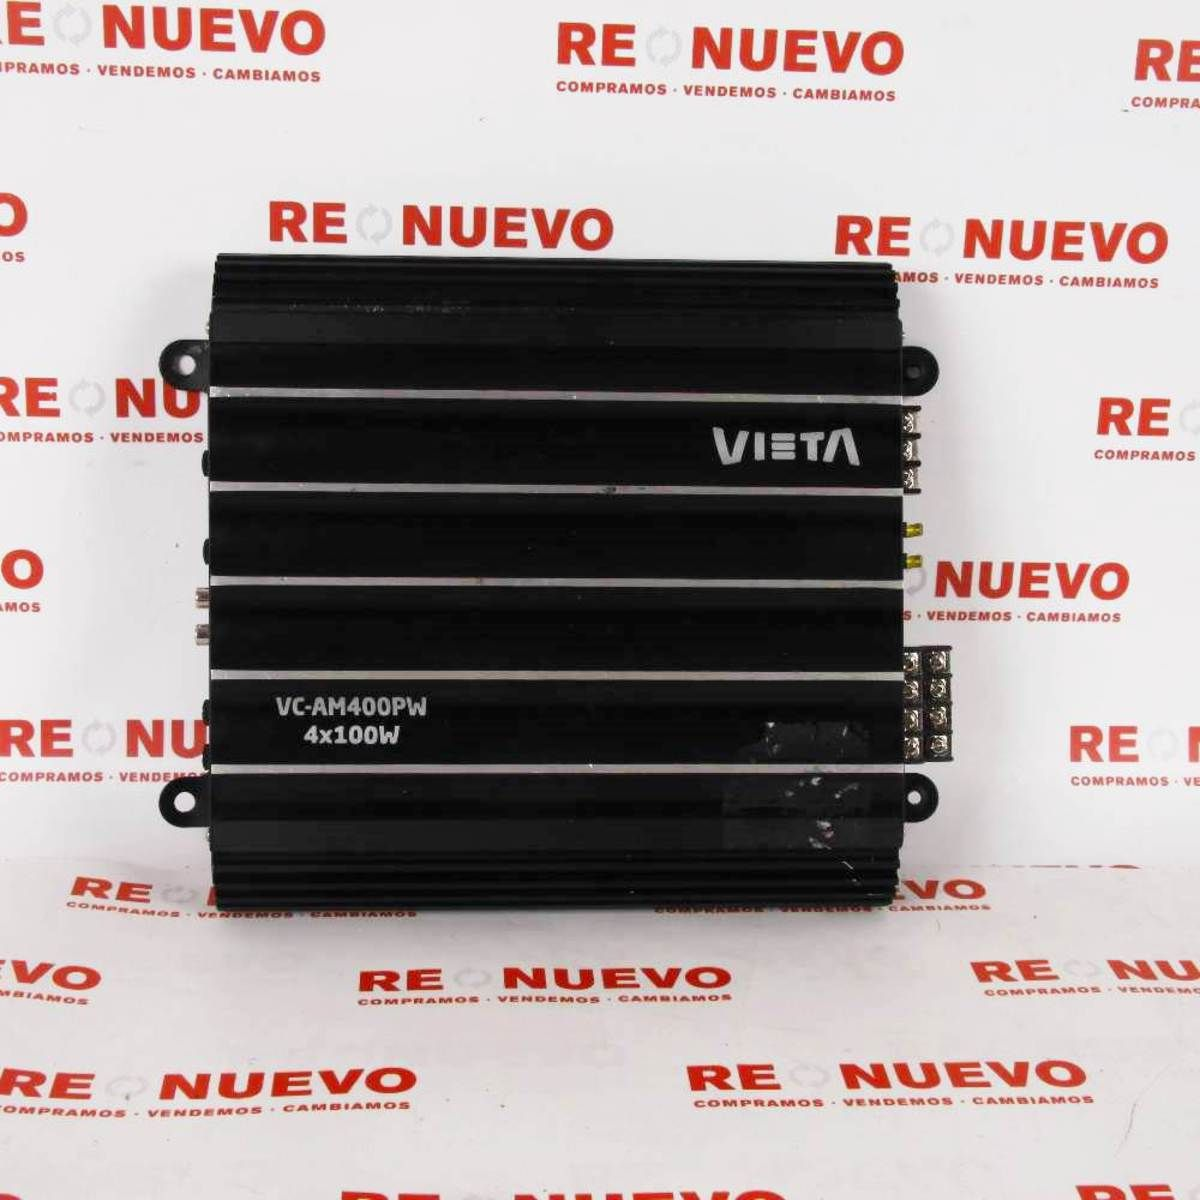 #Etapa de potencia #VIETA 400w E270208 de segunda mano | Tienda de Segunda Mano en Barcelona Re-Nuevo #segundamano